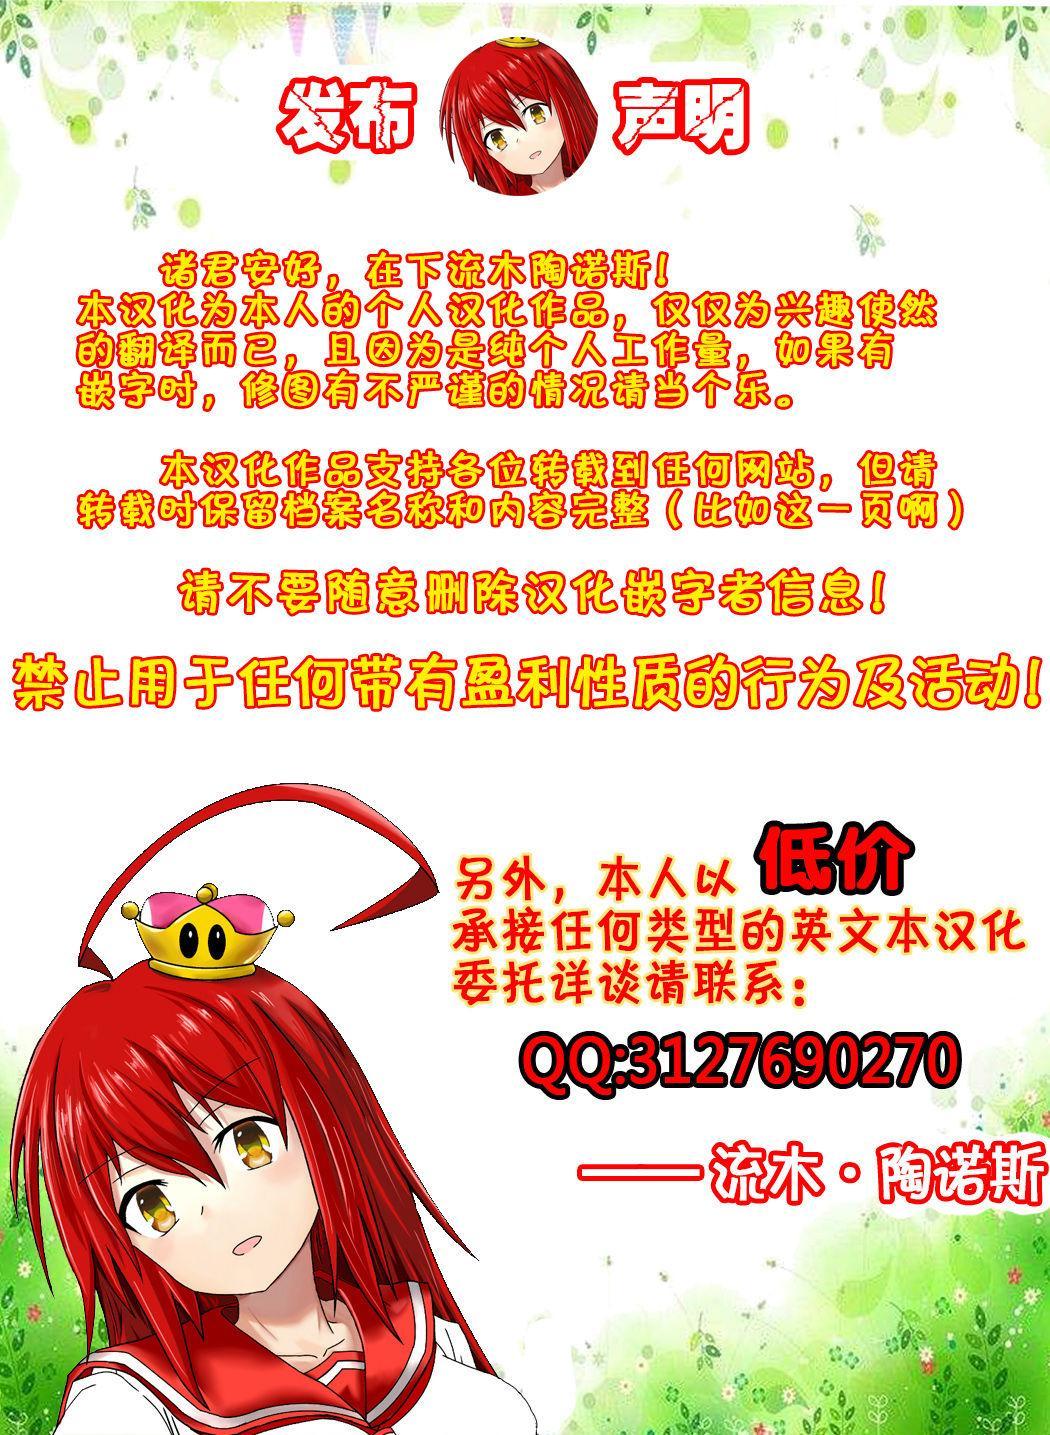 [Merkonig] B-Trayal 22-5 Akeno(Highschool DxD) [Chinese] [流木个人汉化] 17